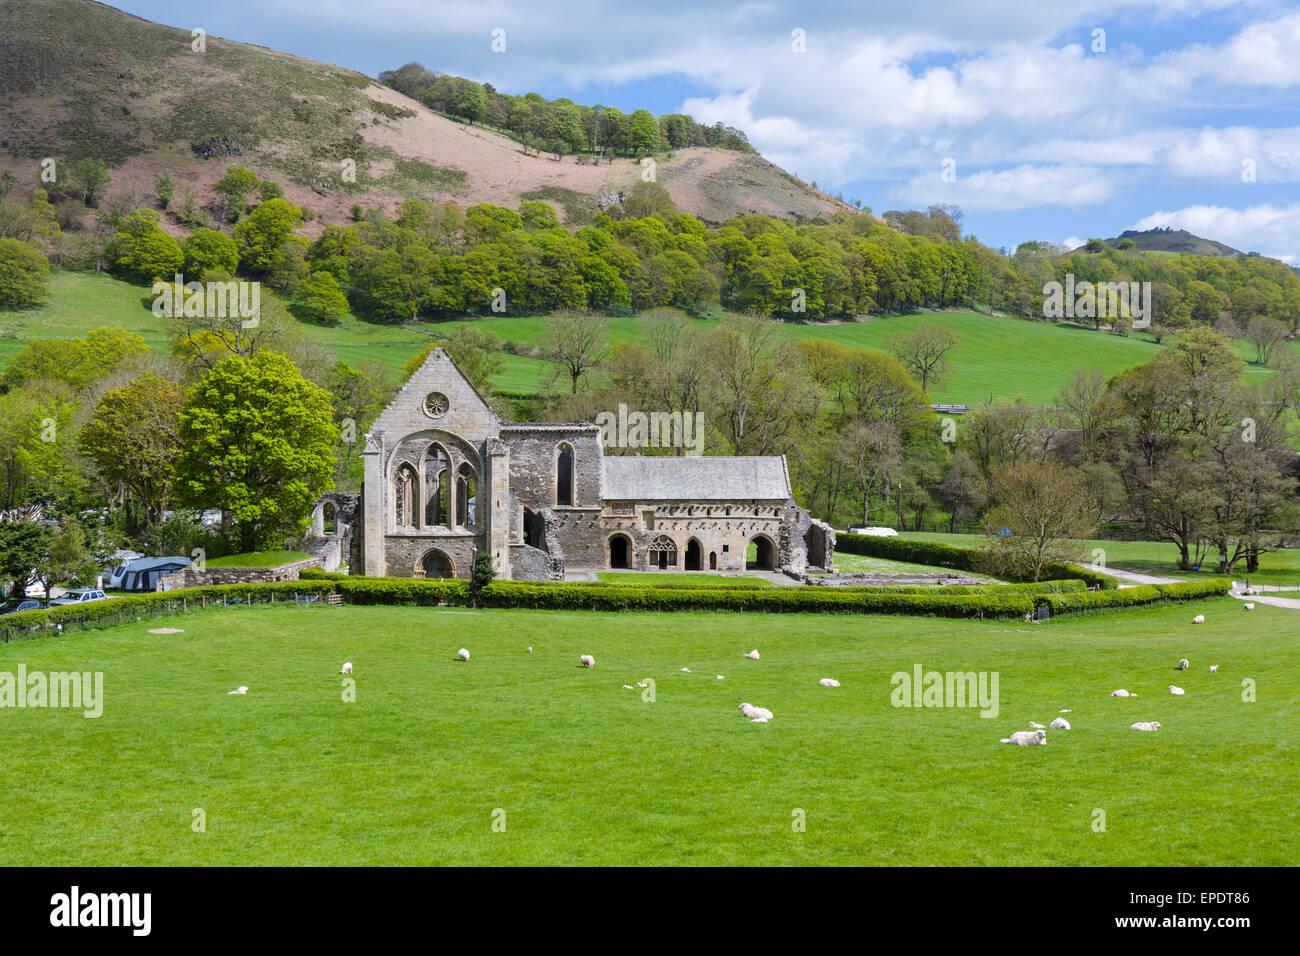 Valle Crucis Abbey, near Llangollen, Denbighshire, Wales, UK Stock Photo